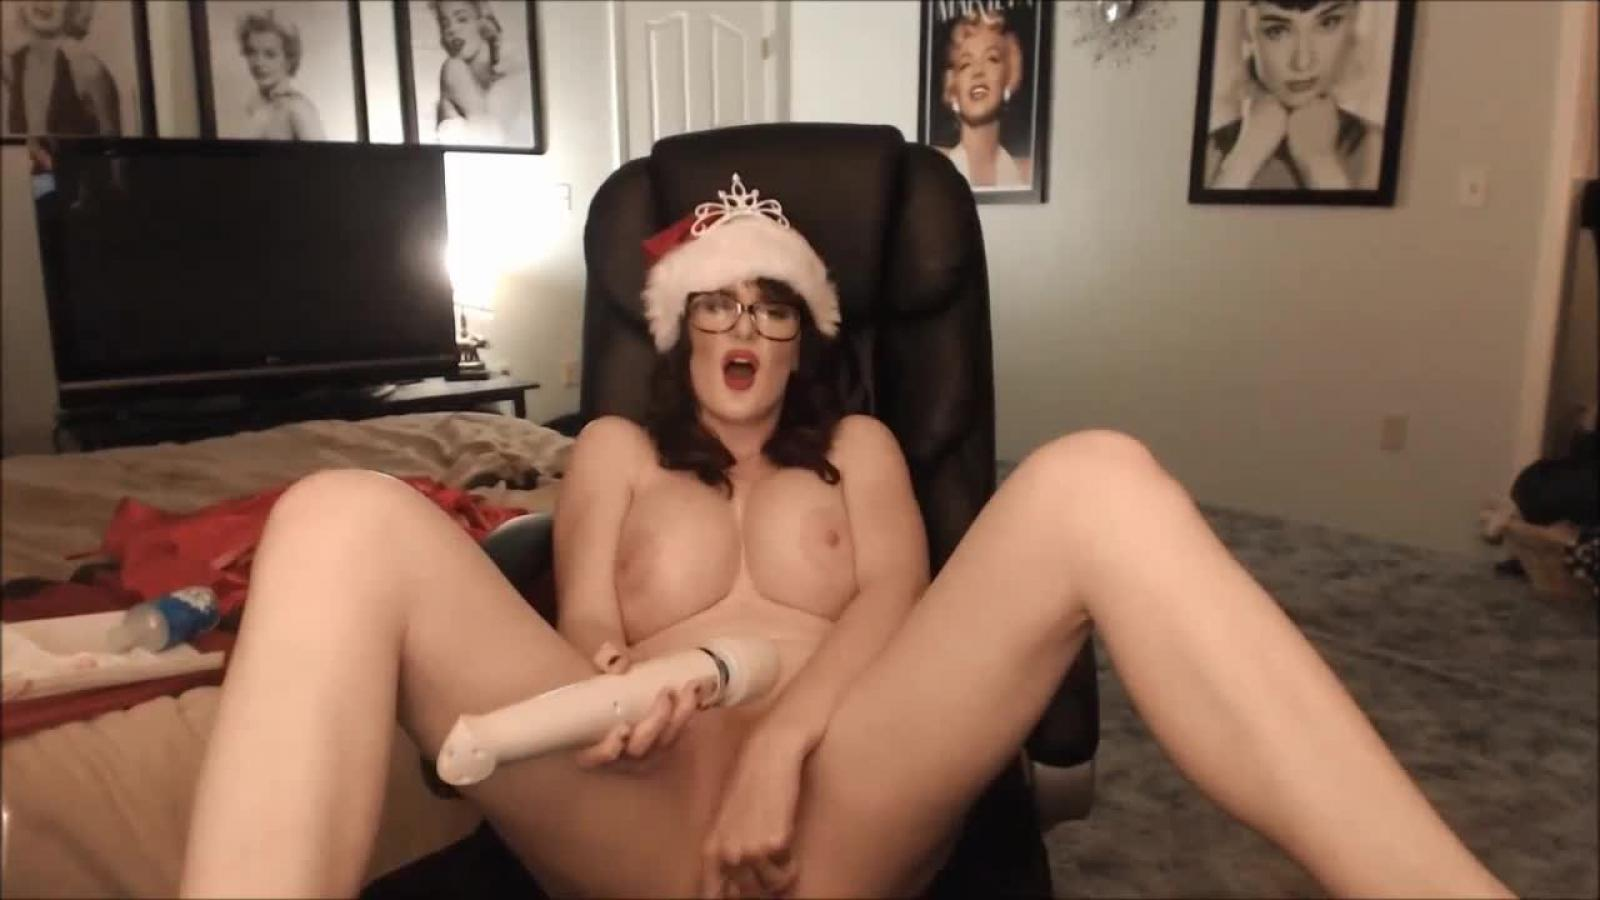 Merry fucking christmas candle i saw mommy kissing santa